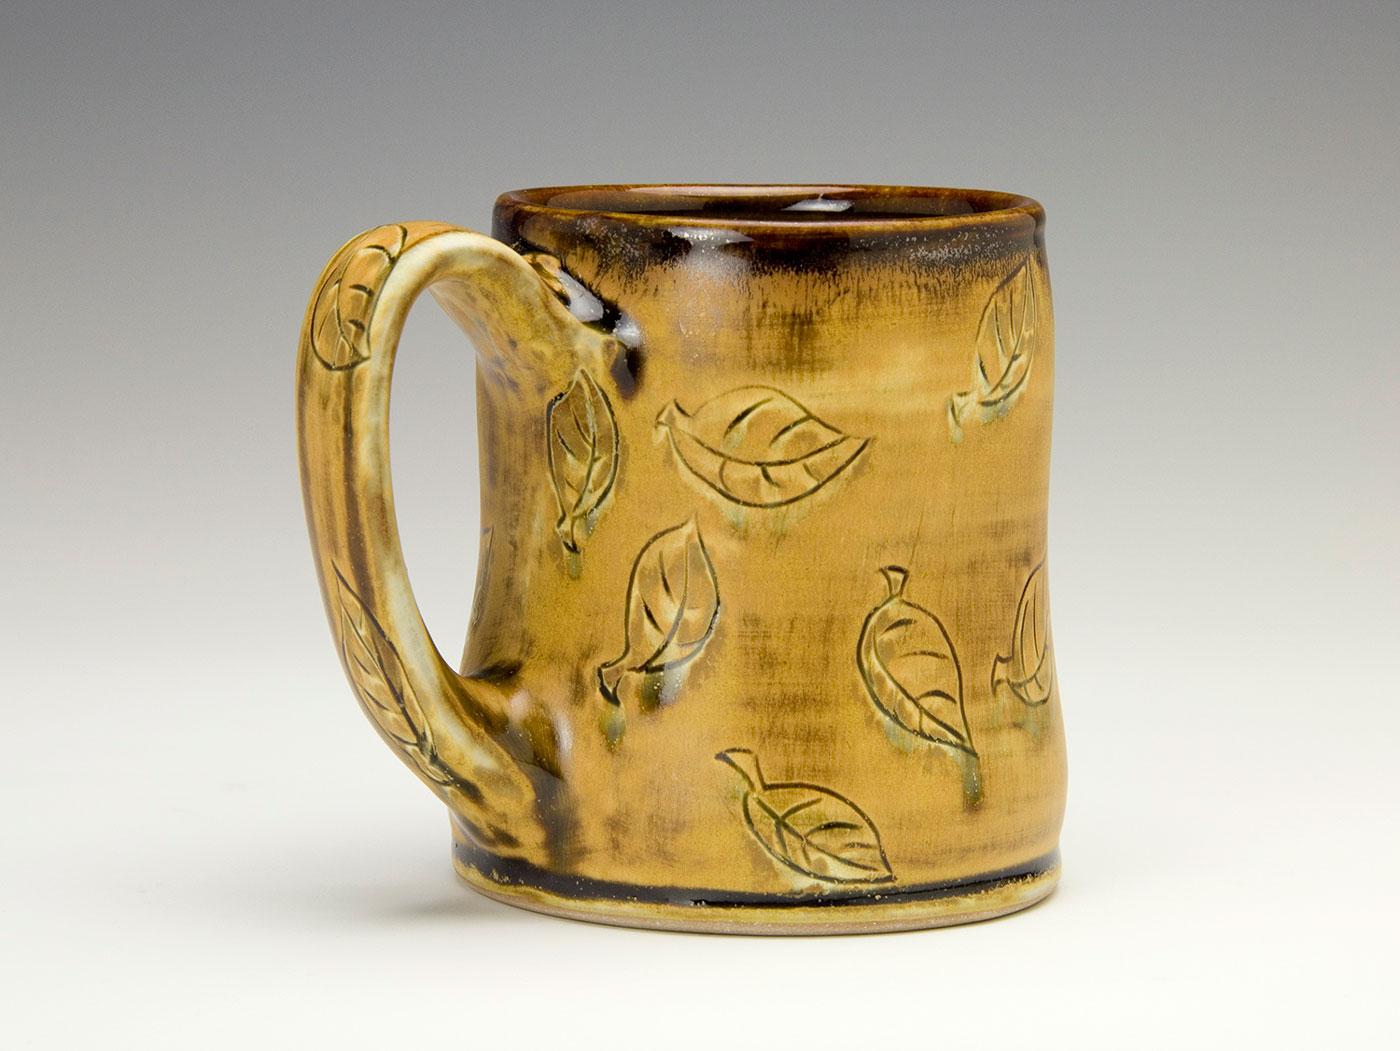 Leaves-on-moka-bronze-contemporary-clay-mug-Samantha-Henneke-Seagrove-Pottery.jpg